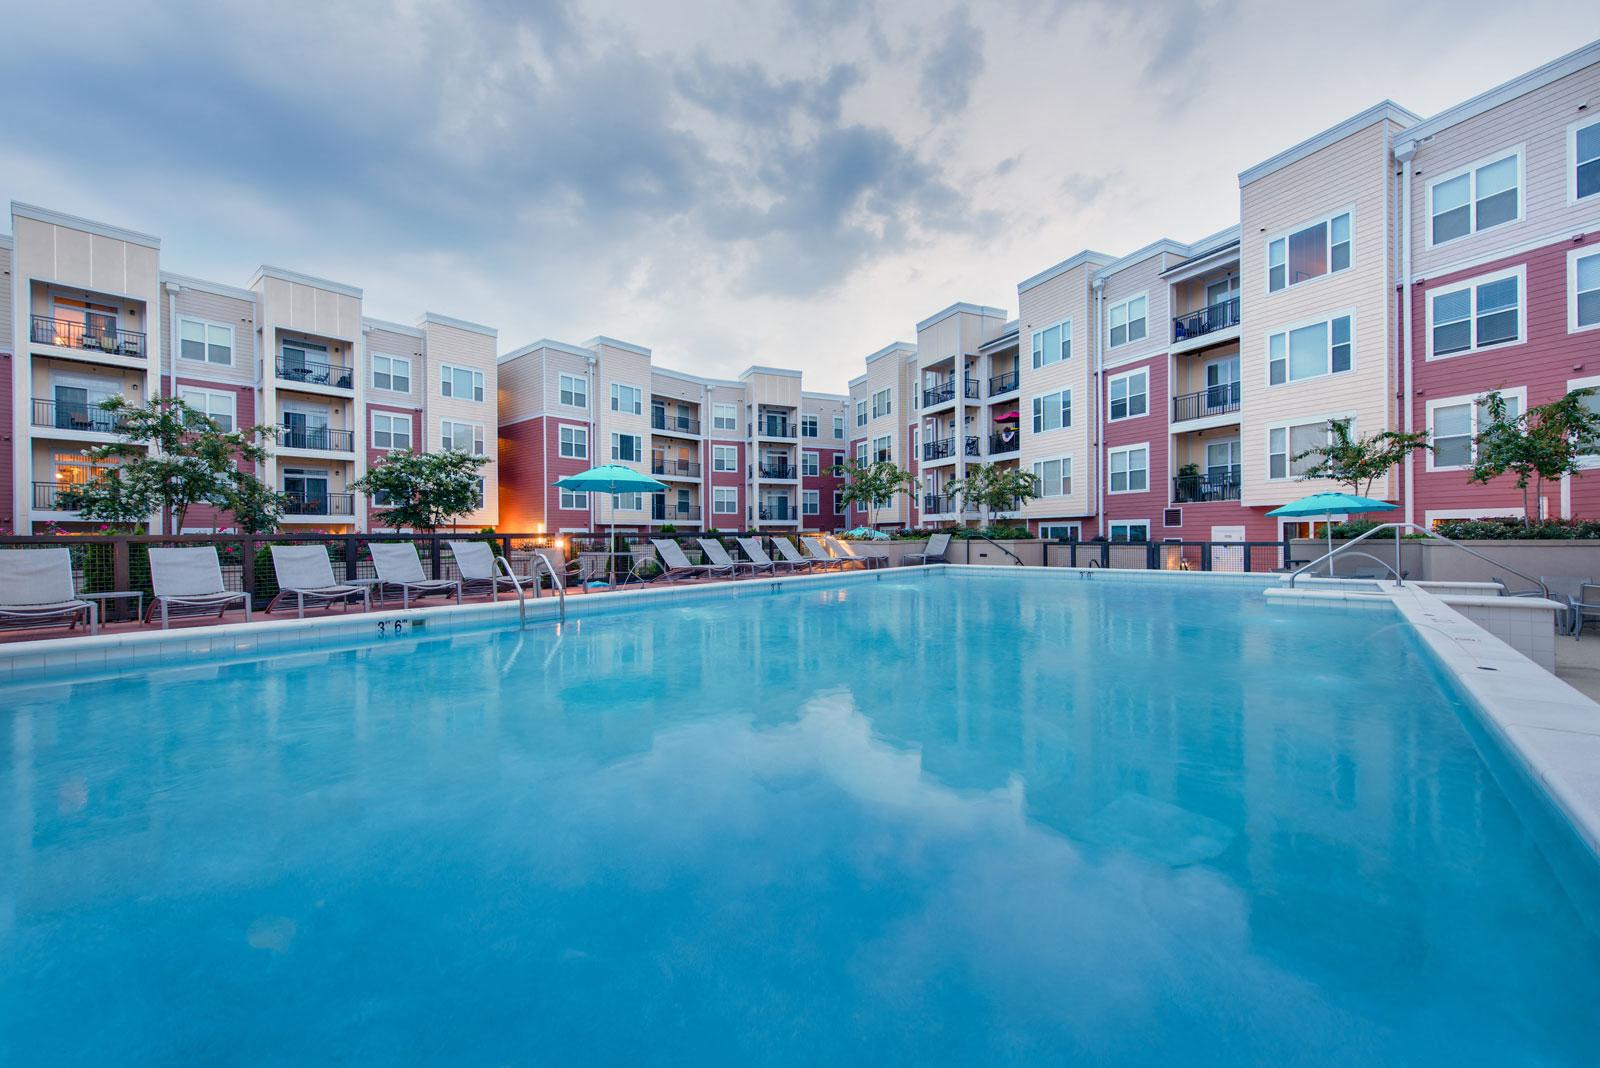 Amazing Sparkling Swimming Pool At The Ridgewood By Windsor, 4211 Ridge Top Road,  Fairfax, Photo